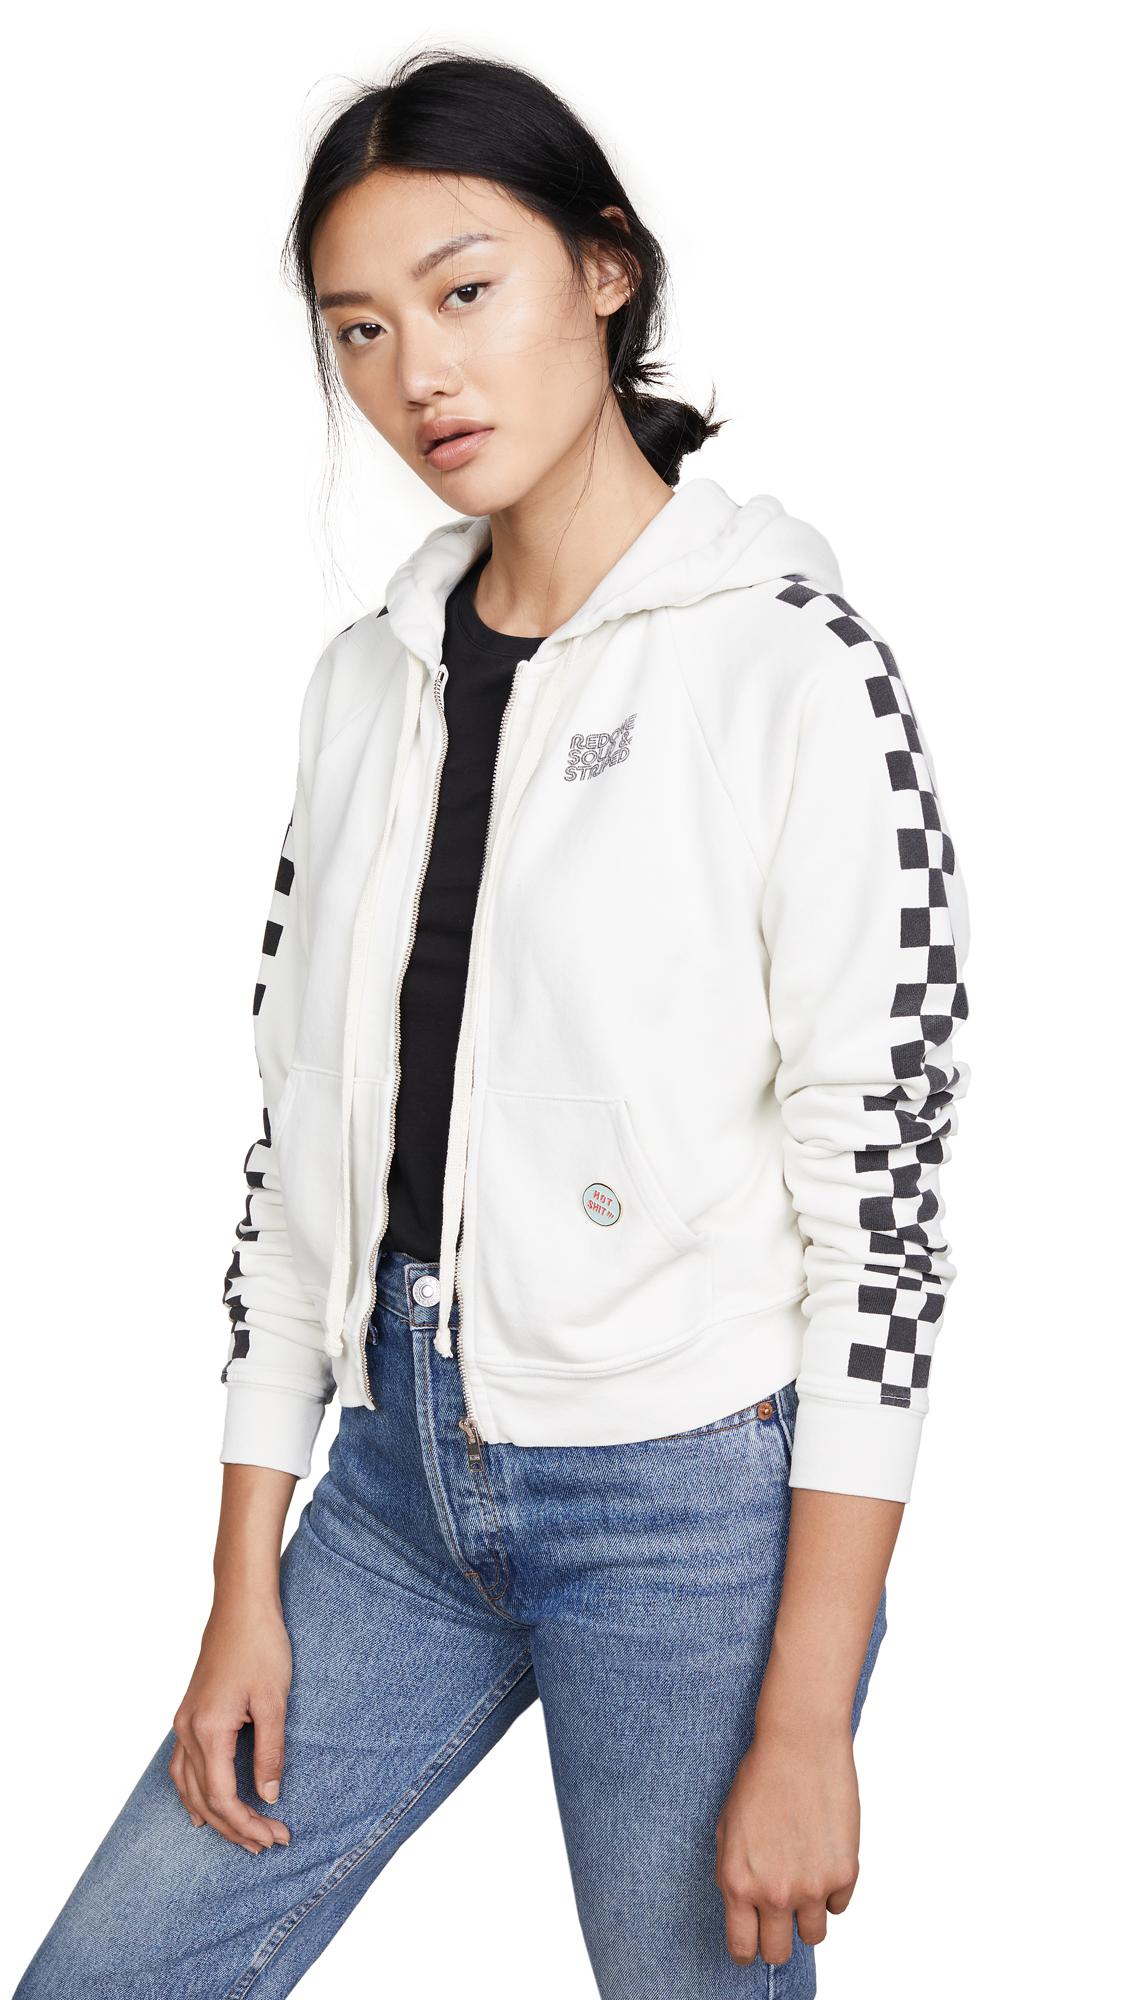 Solid & Striped x RE/DONE Malibu Sweatshirt In Dirty White